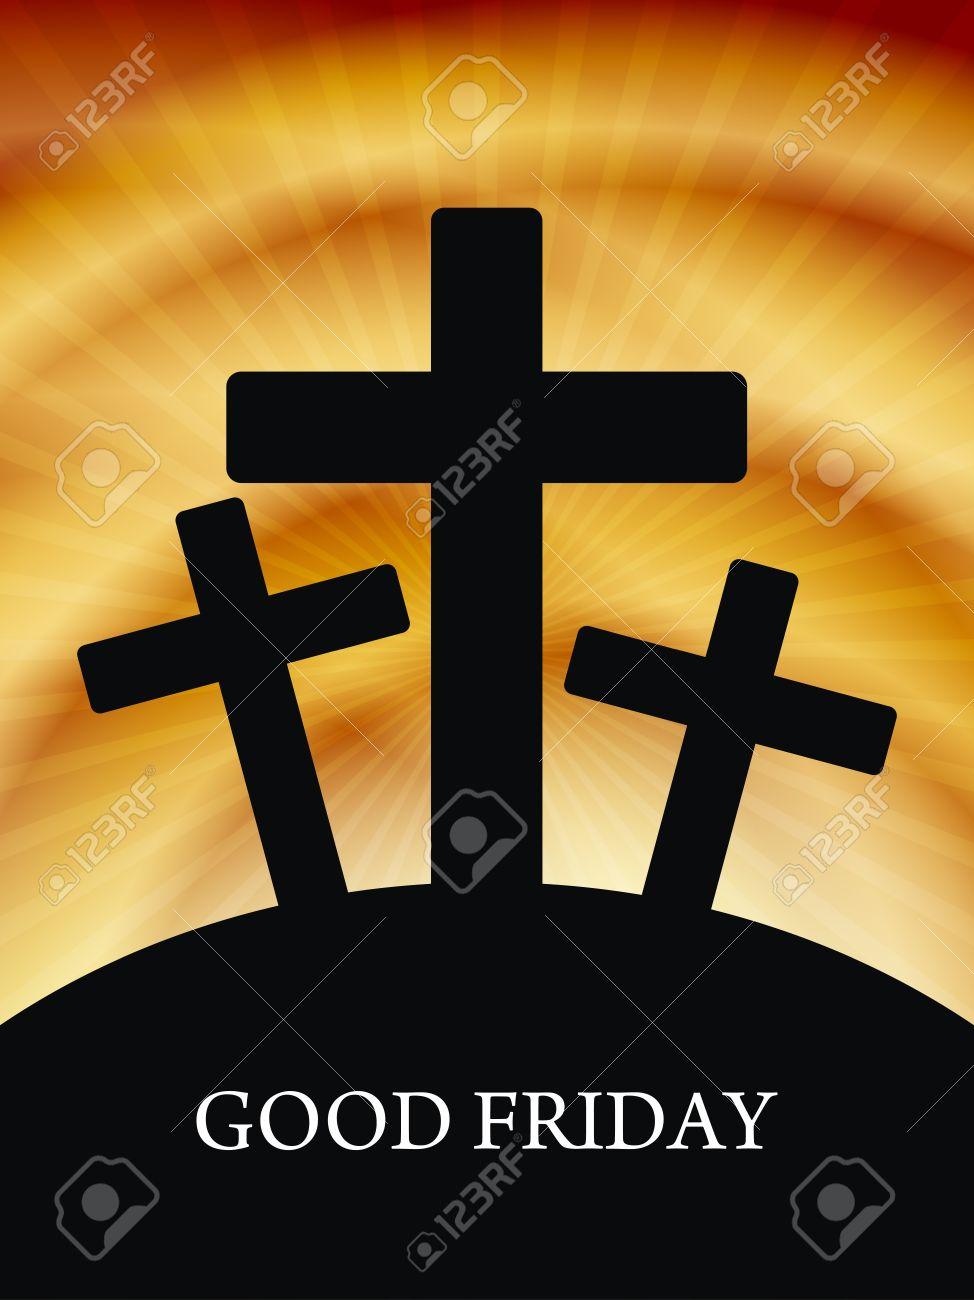 Good Friday Clip Art Christian  Clipart Panda Free